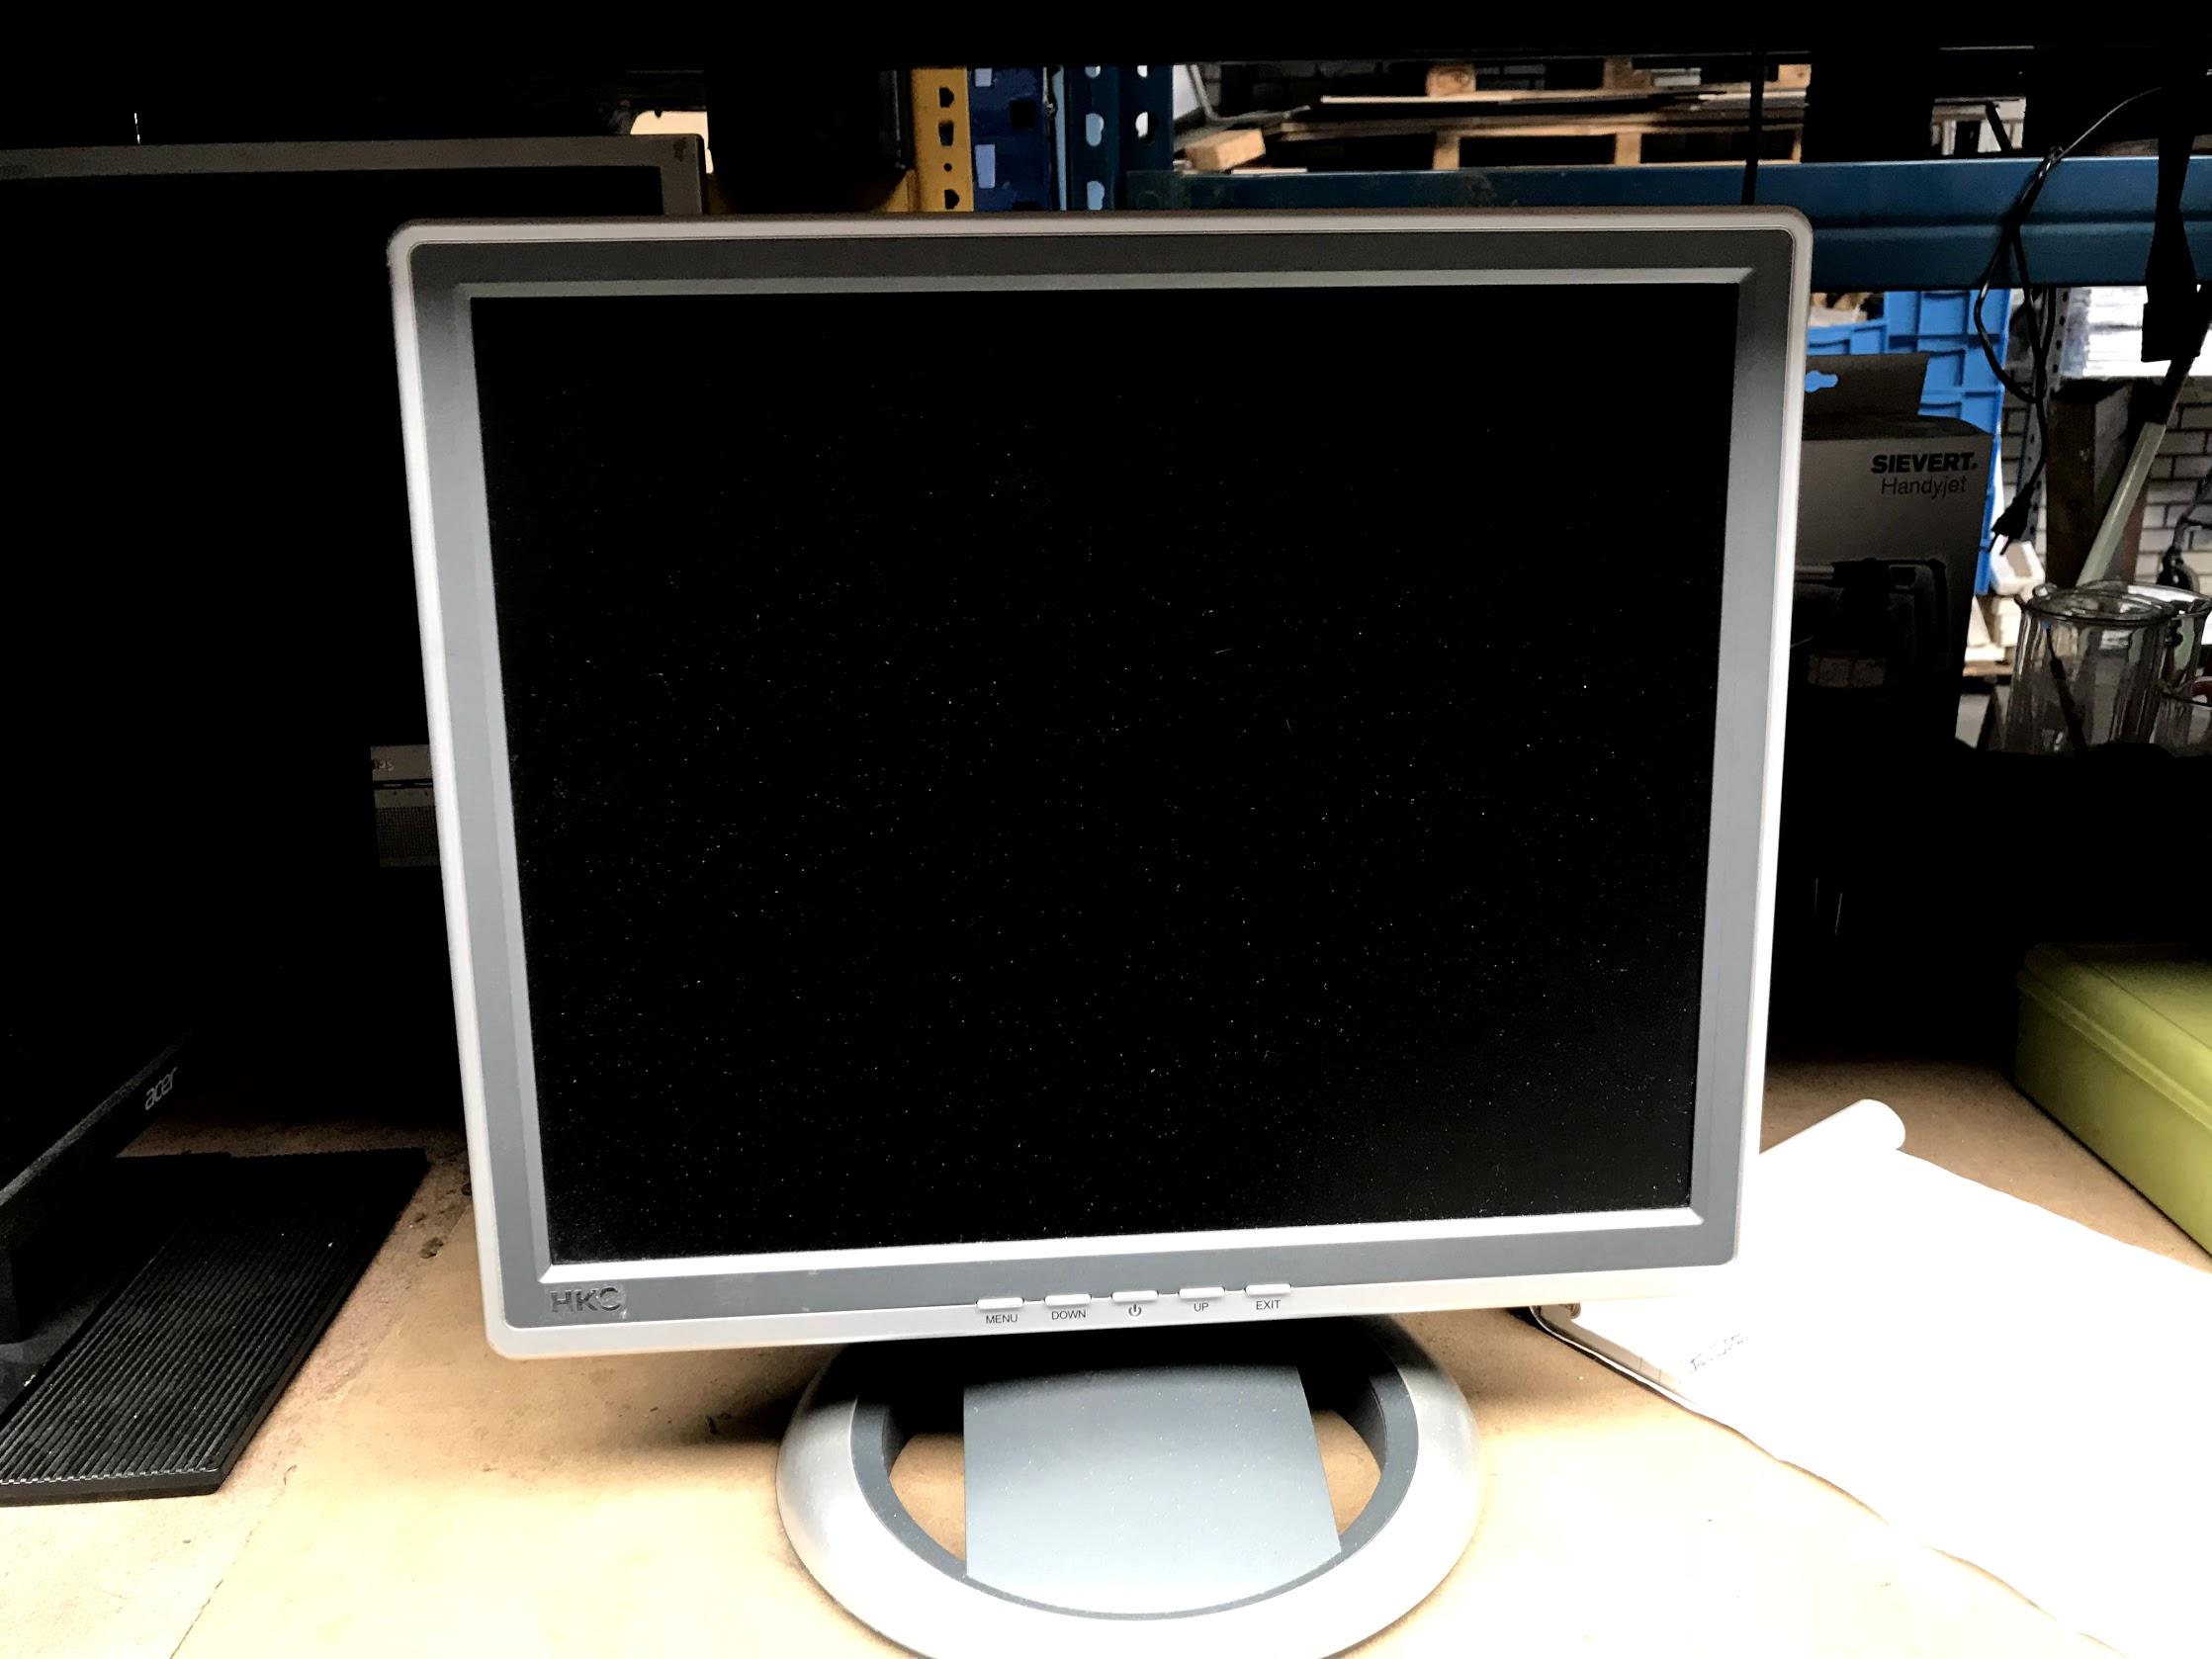 HKC monitor